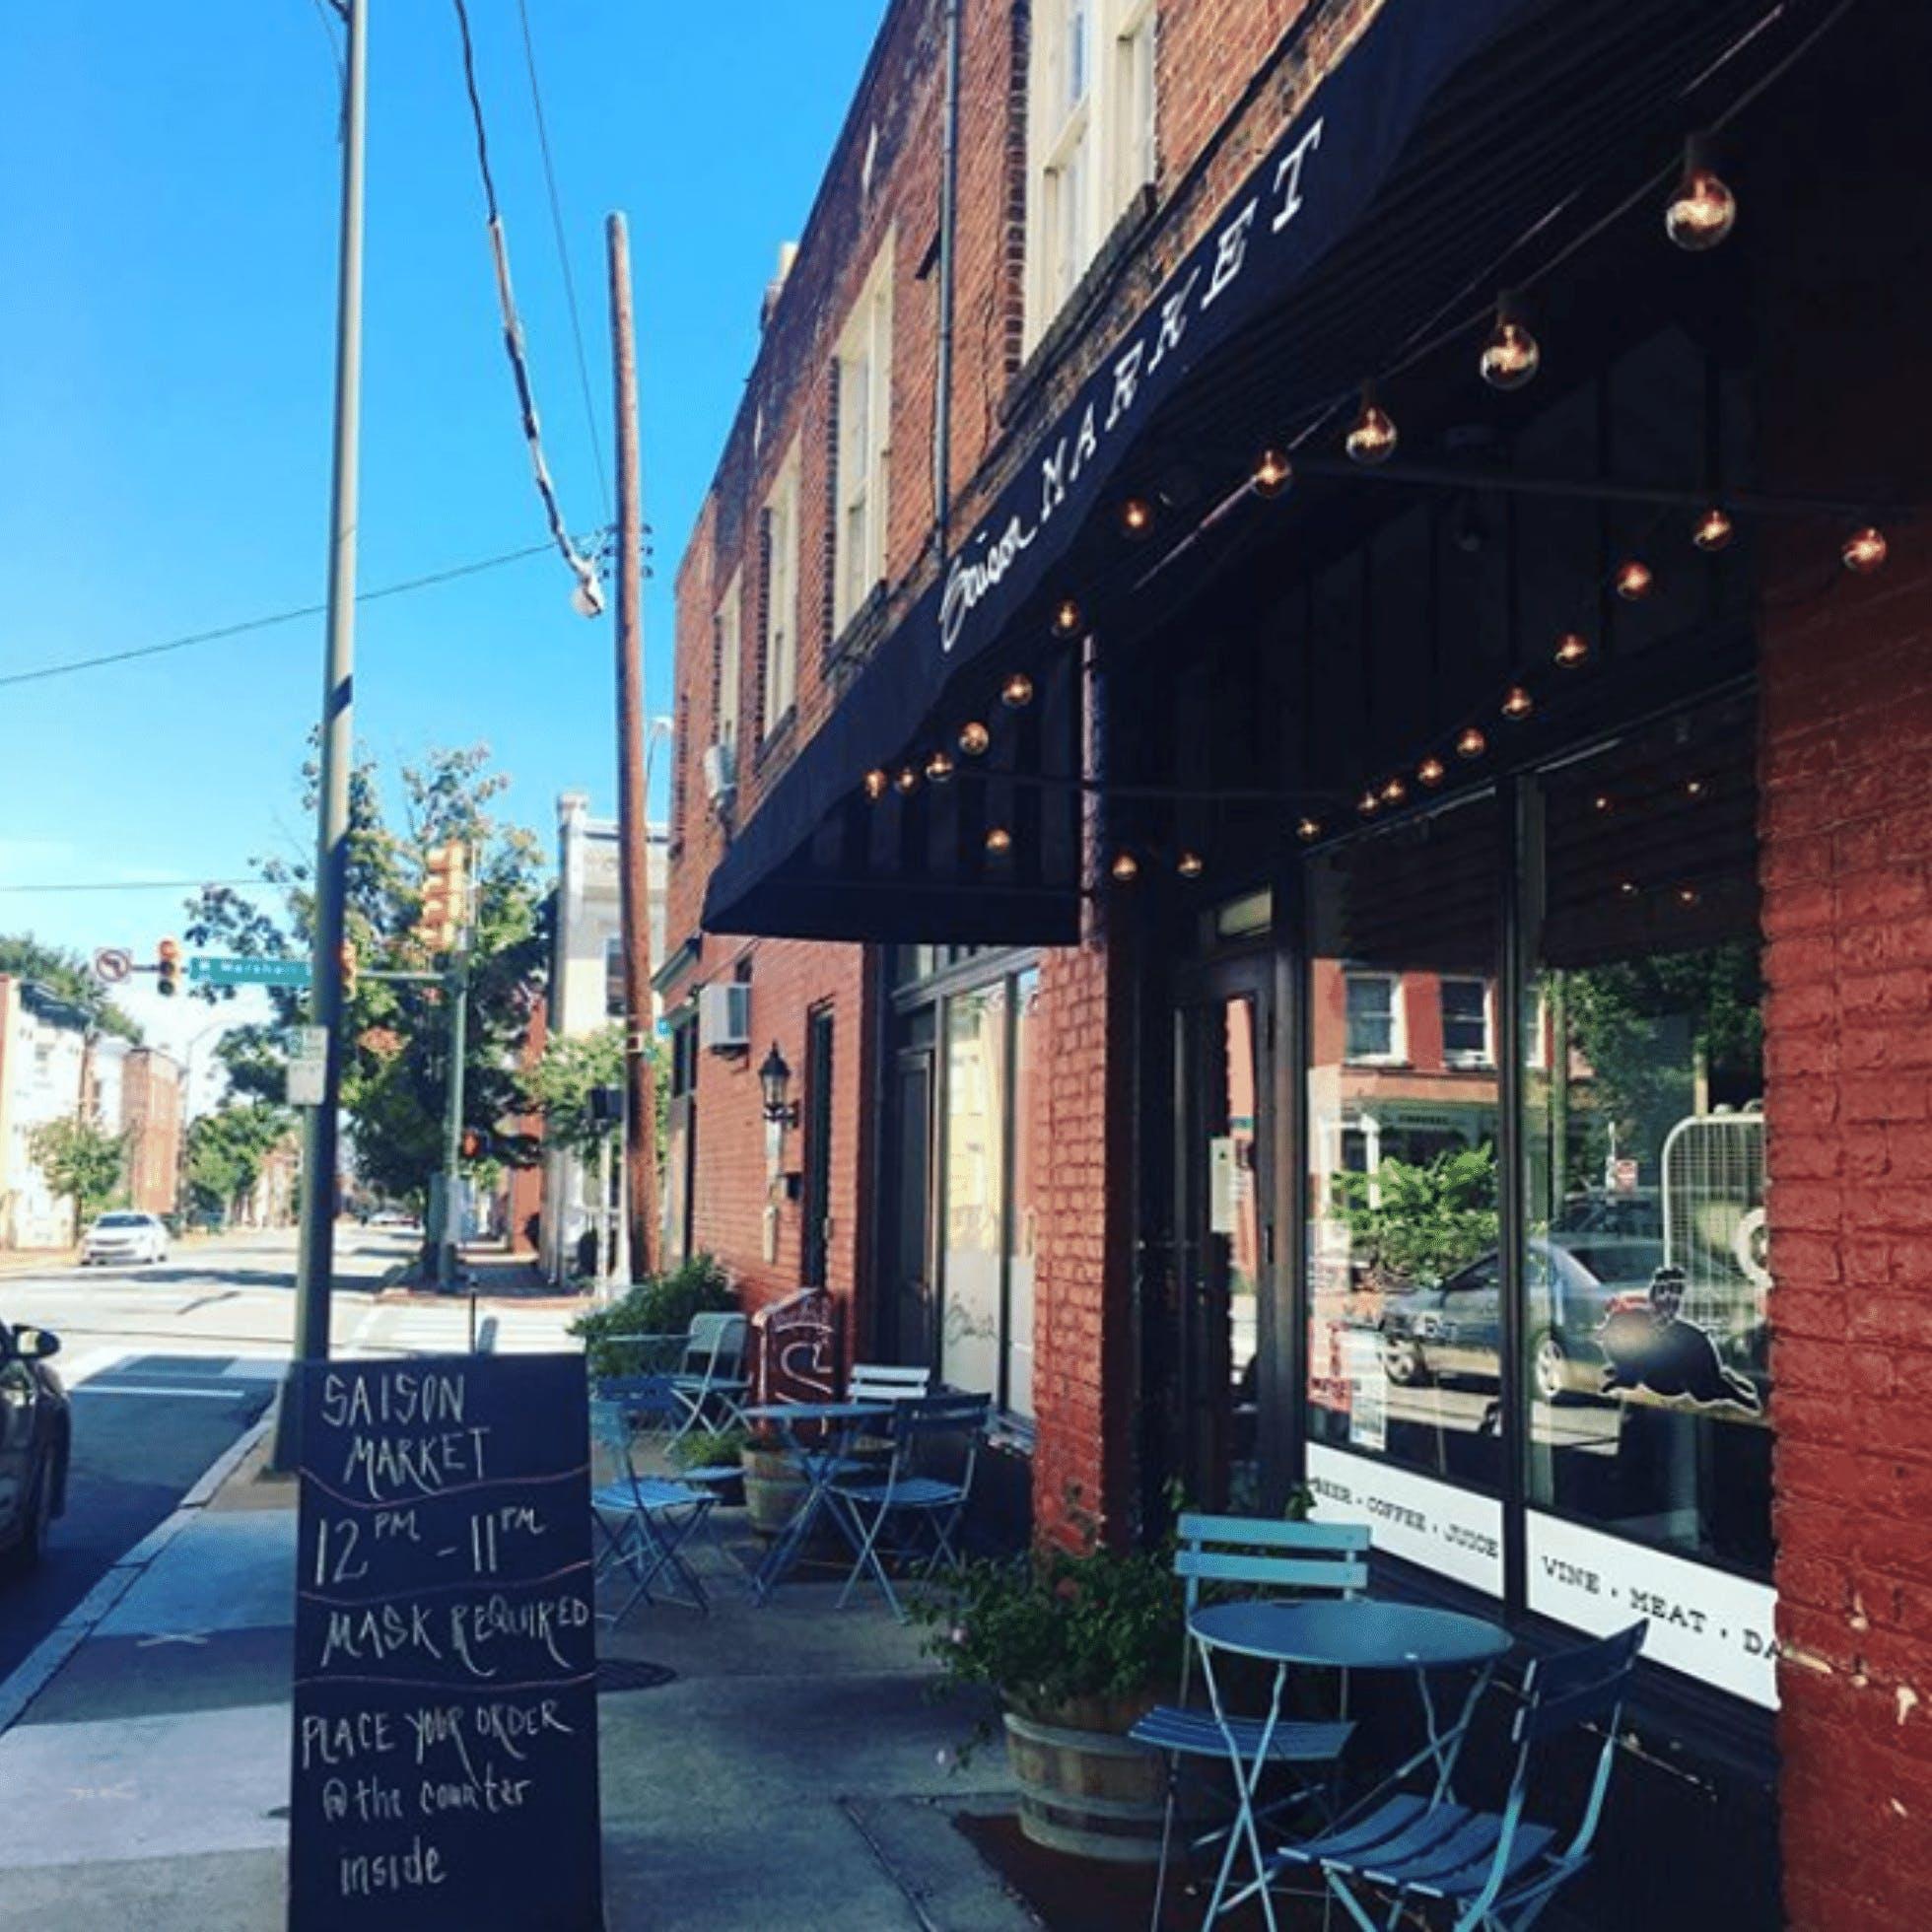 Saison Market  - 15 Restaurants for Outdoor Dining in Downtown Richmond